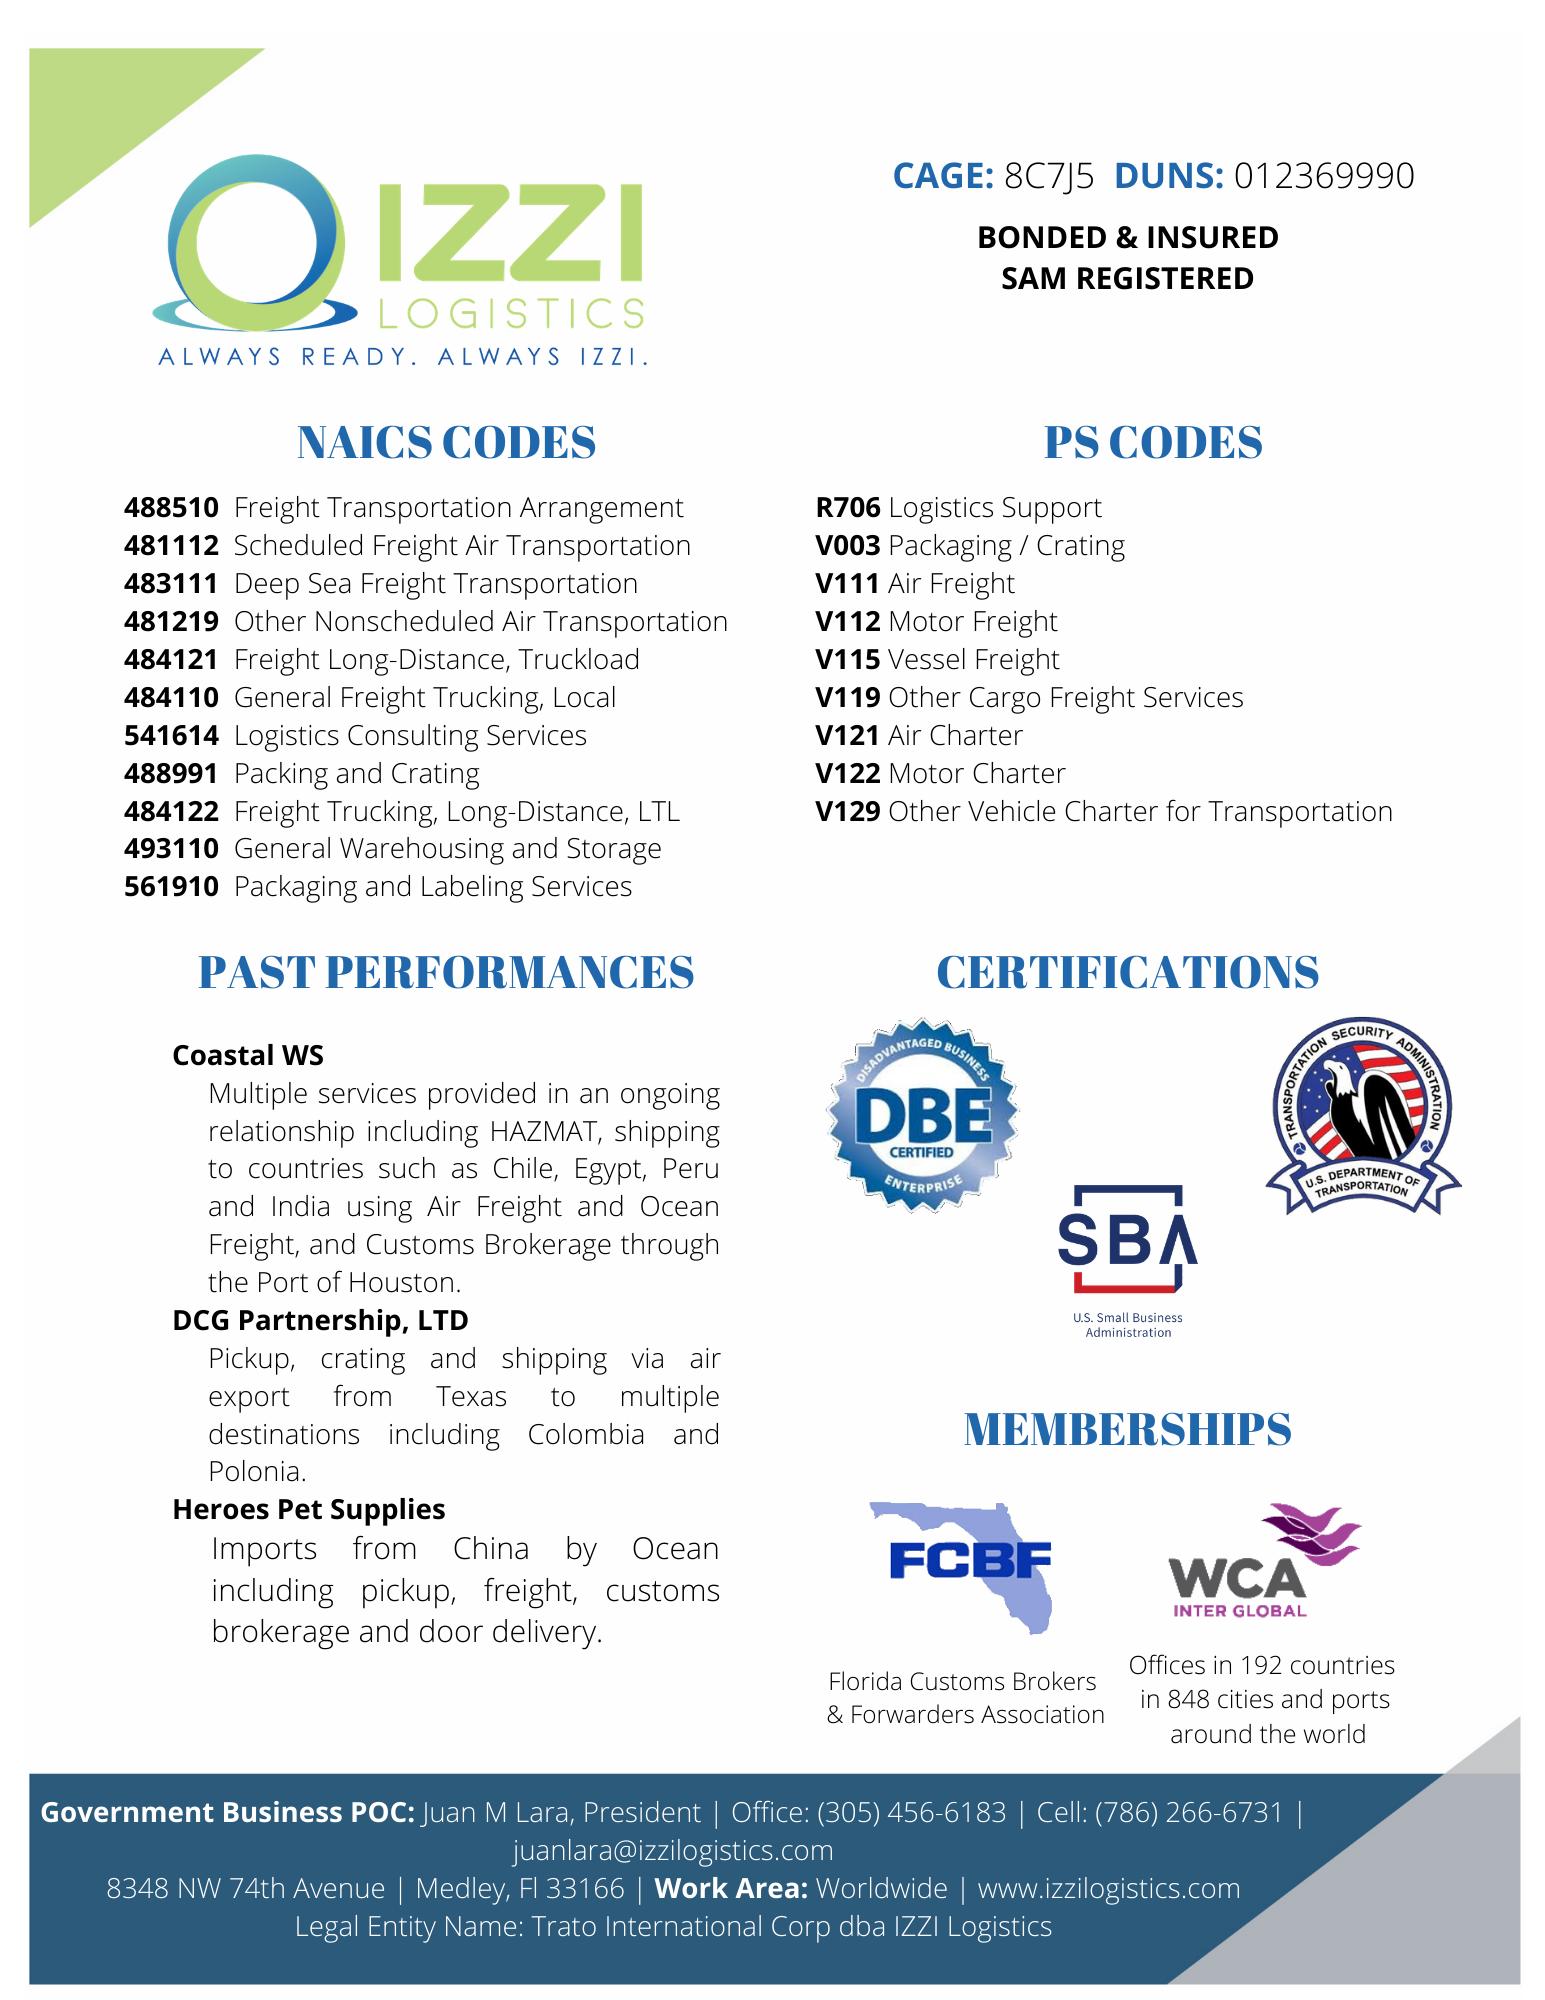 IZZI Logistics Capability Statement